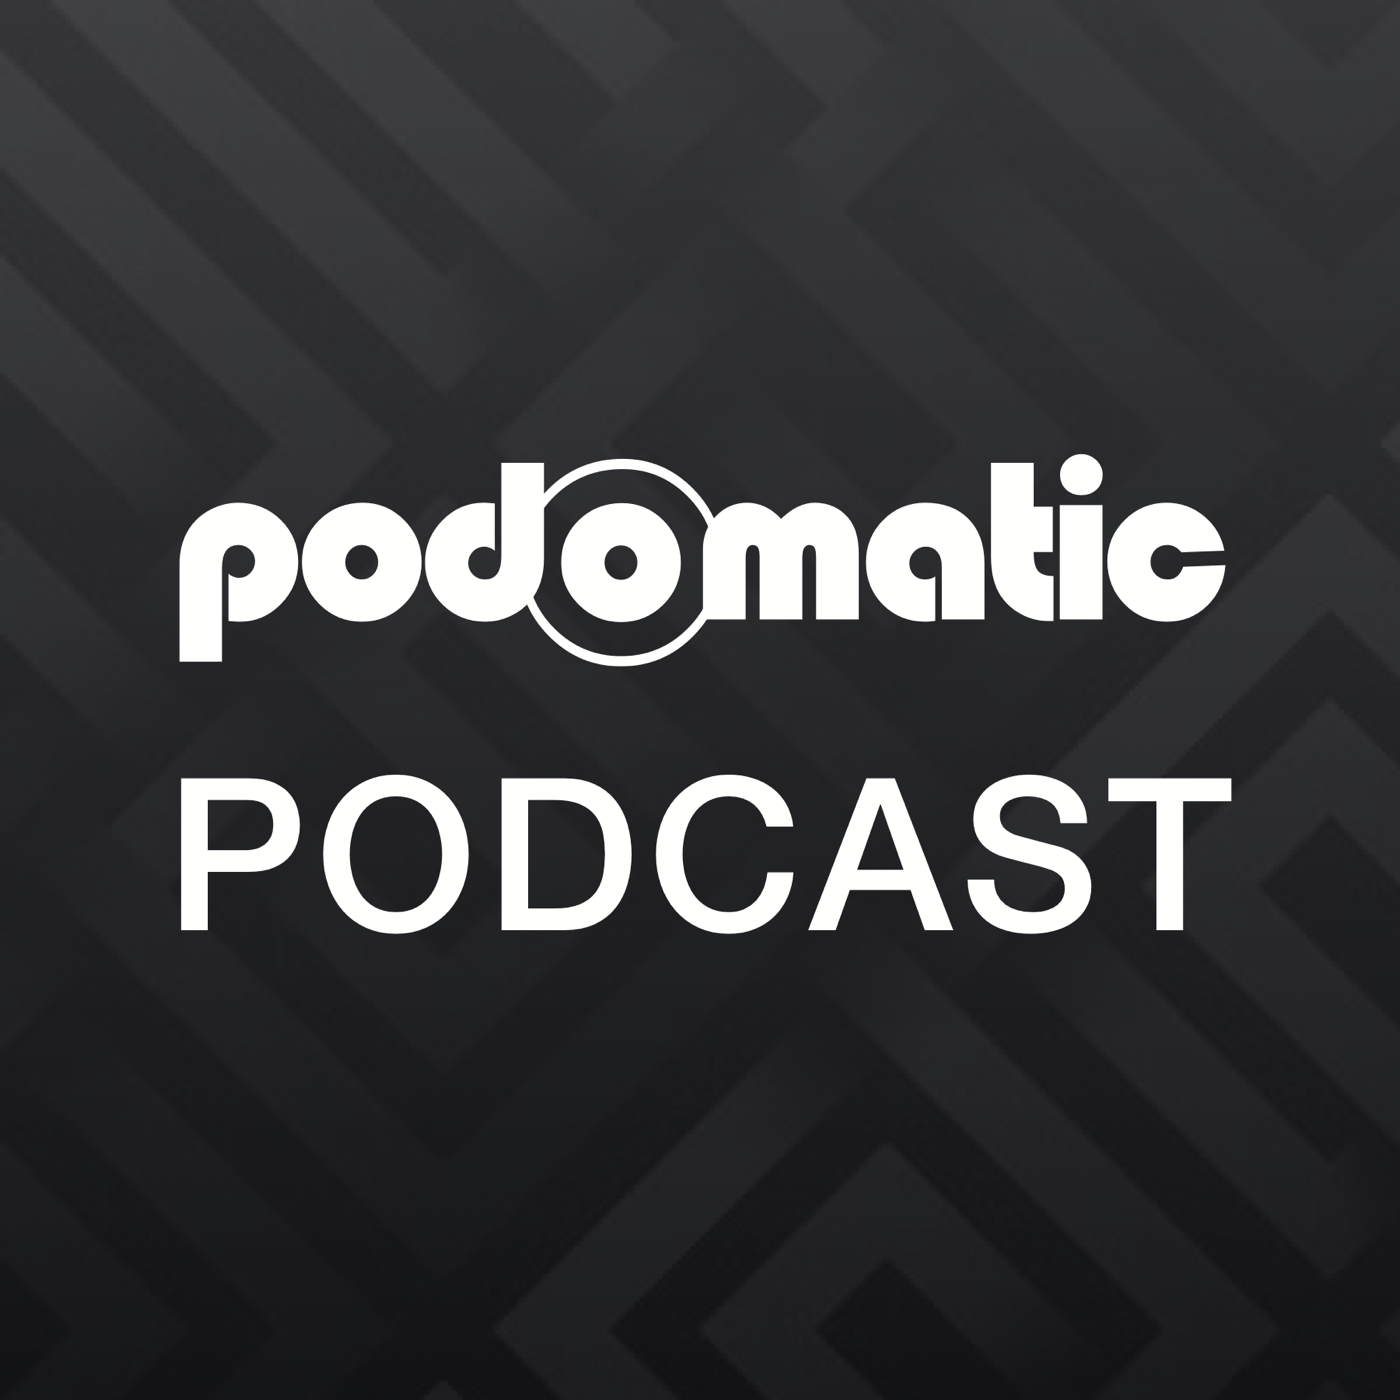 robb overholt's Podcast